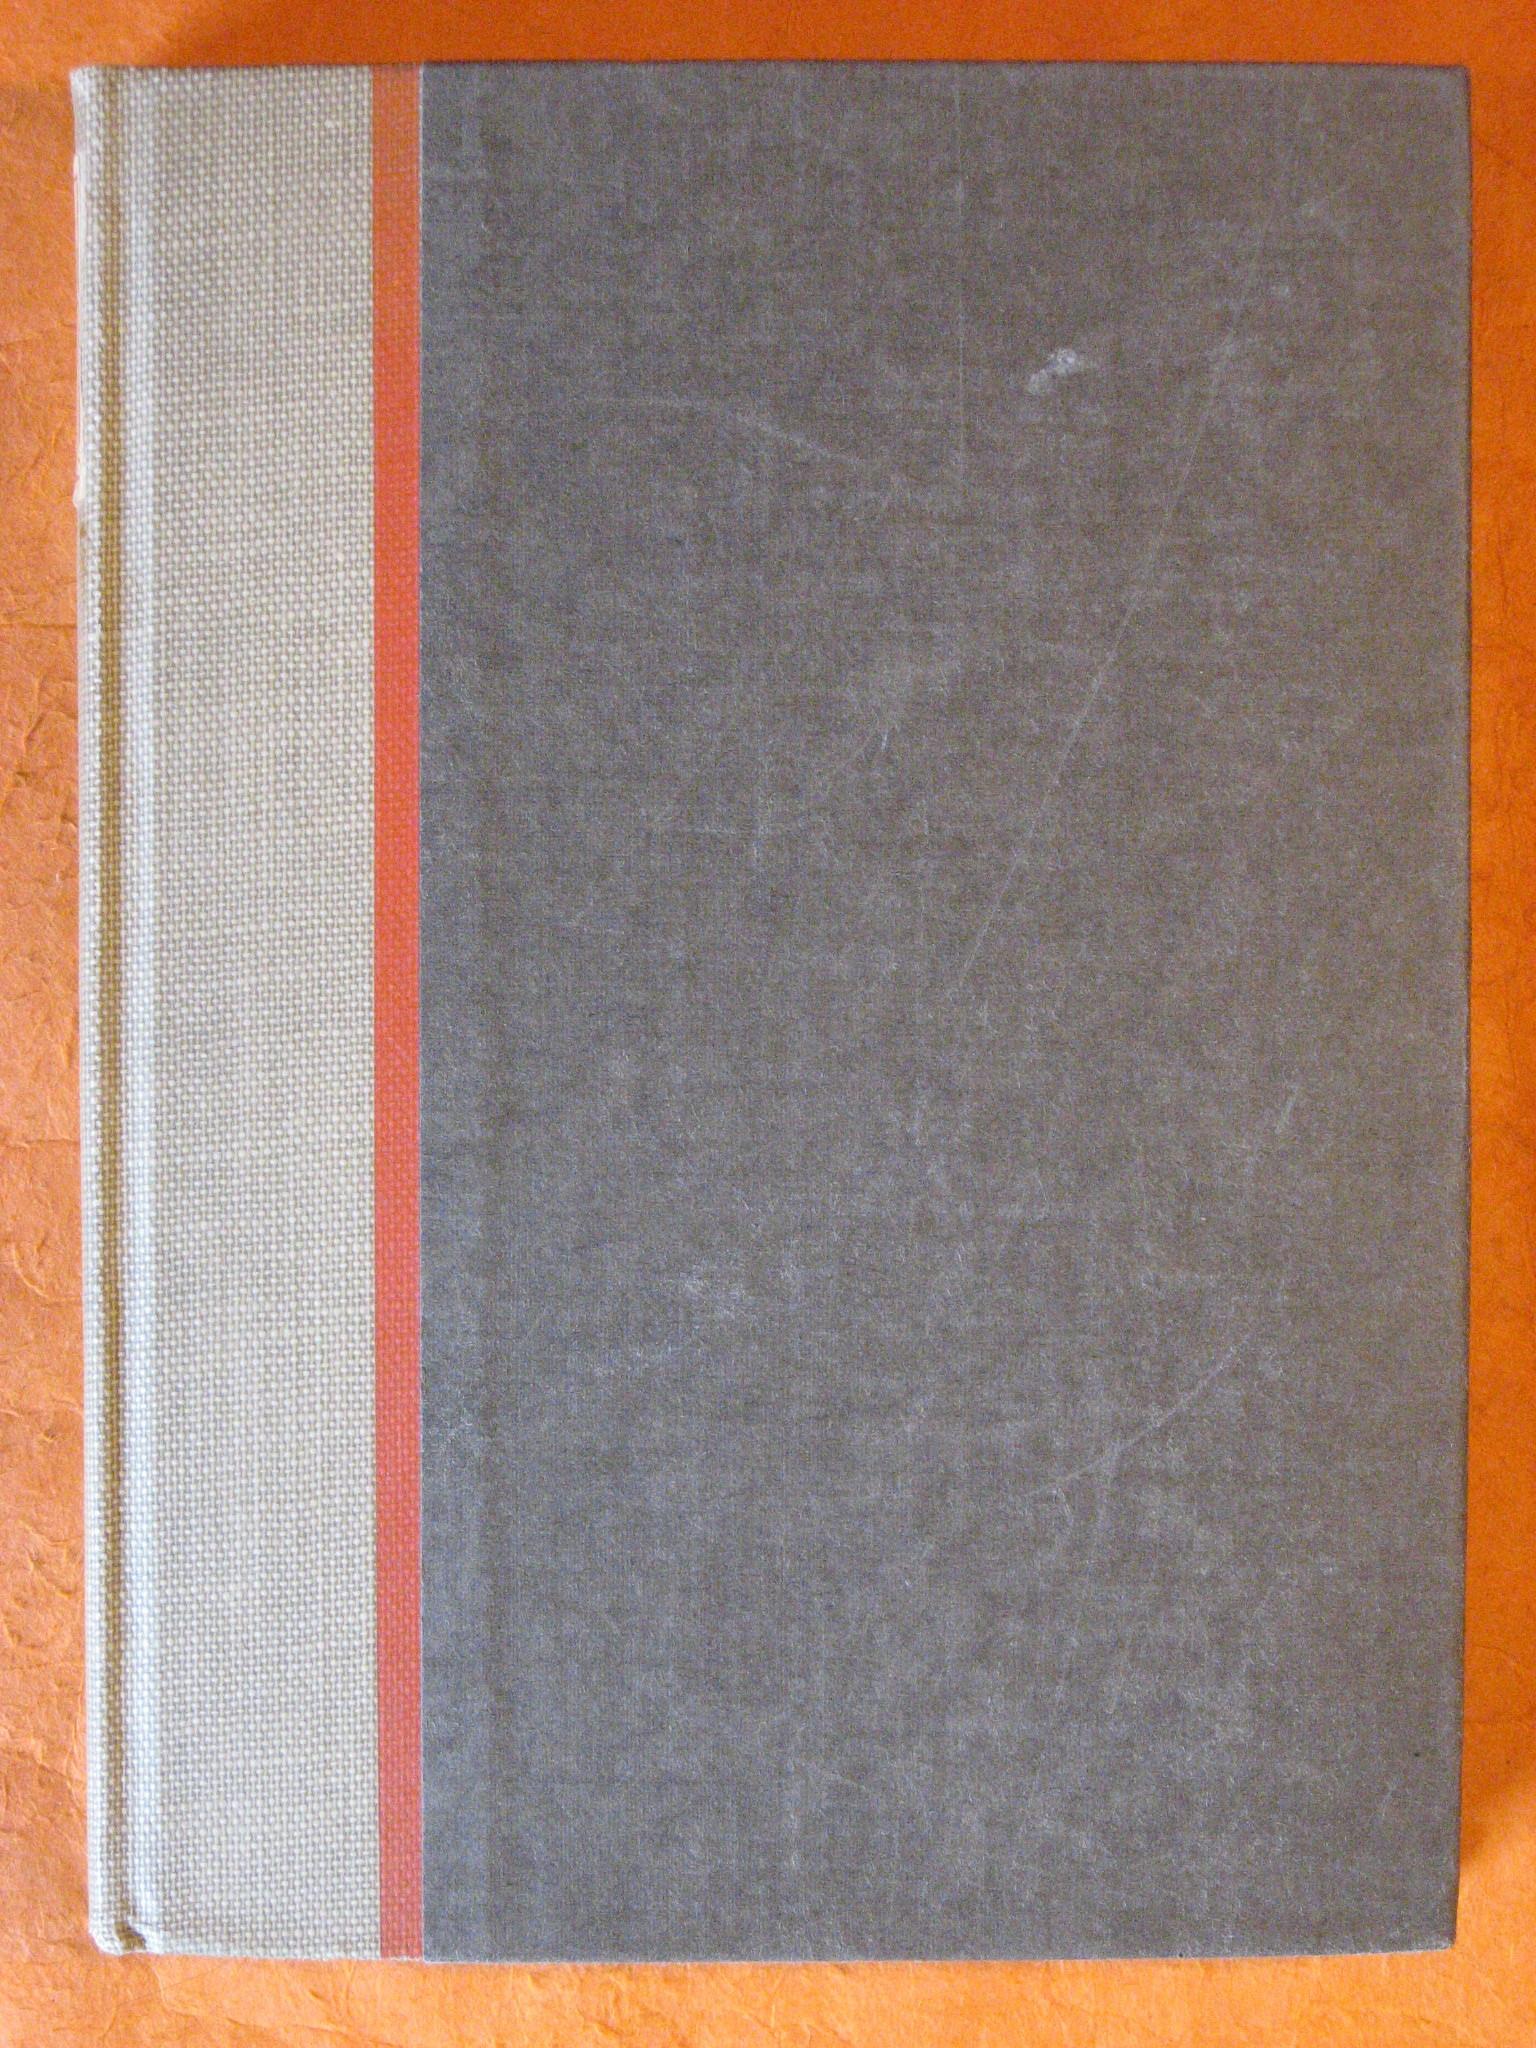 Fallodon Papers, Fallodon; Viscount Grey of Fallodon